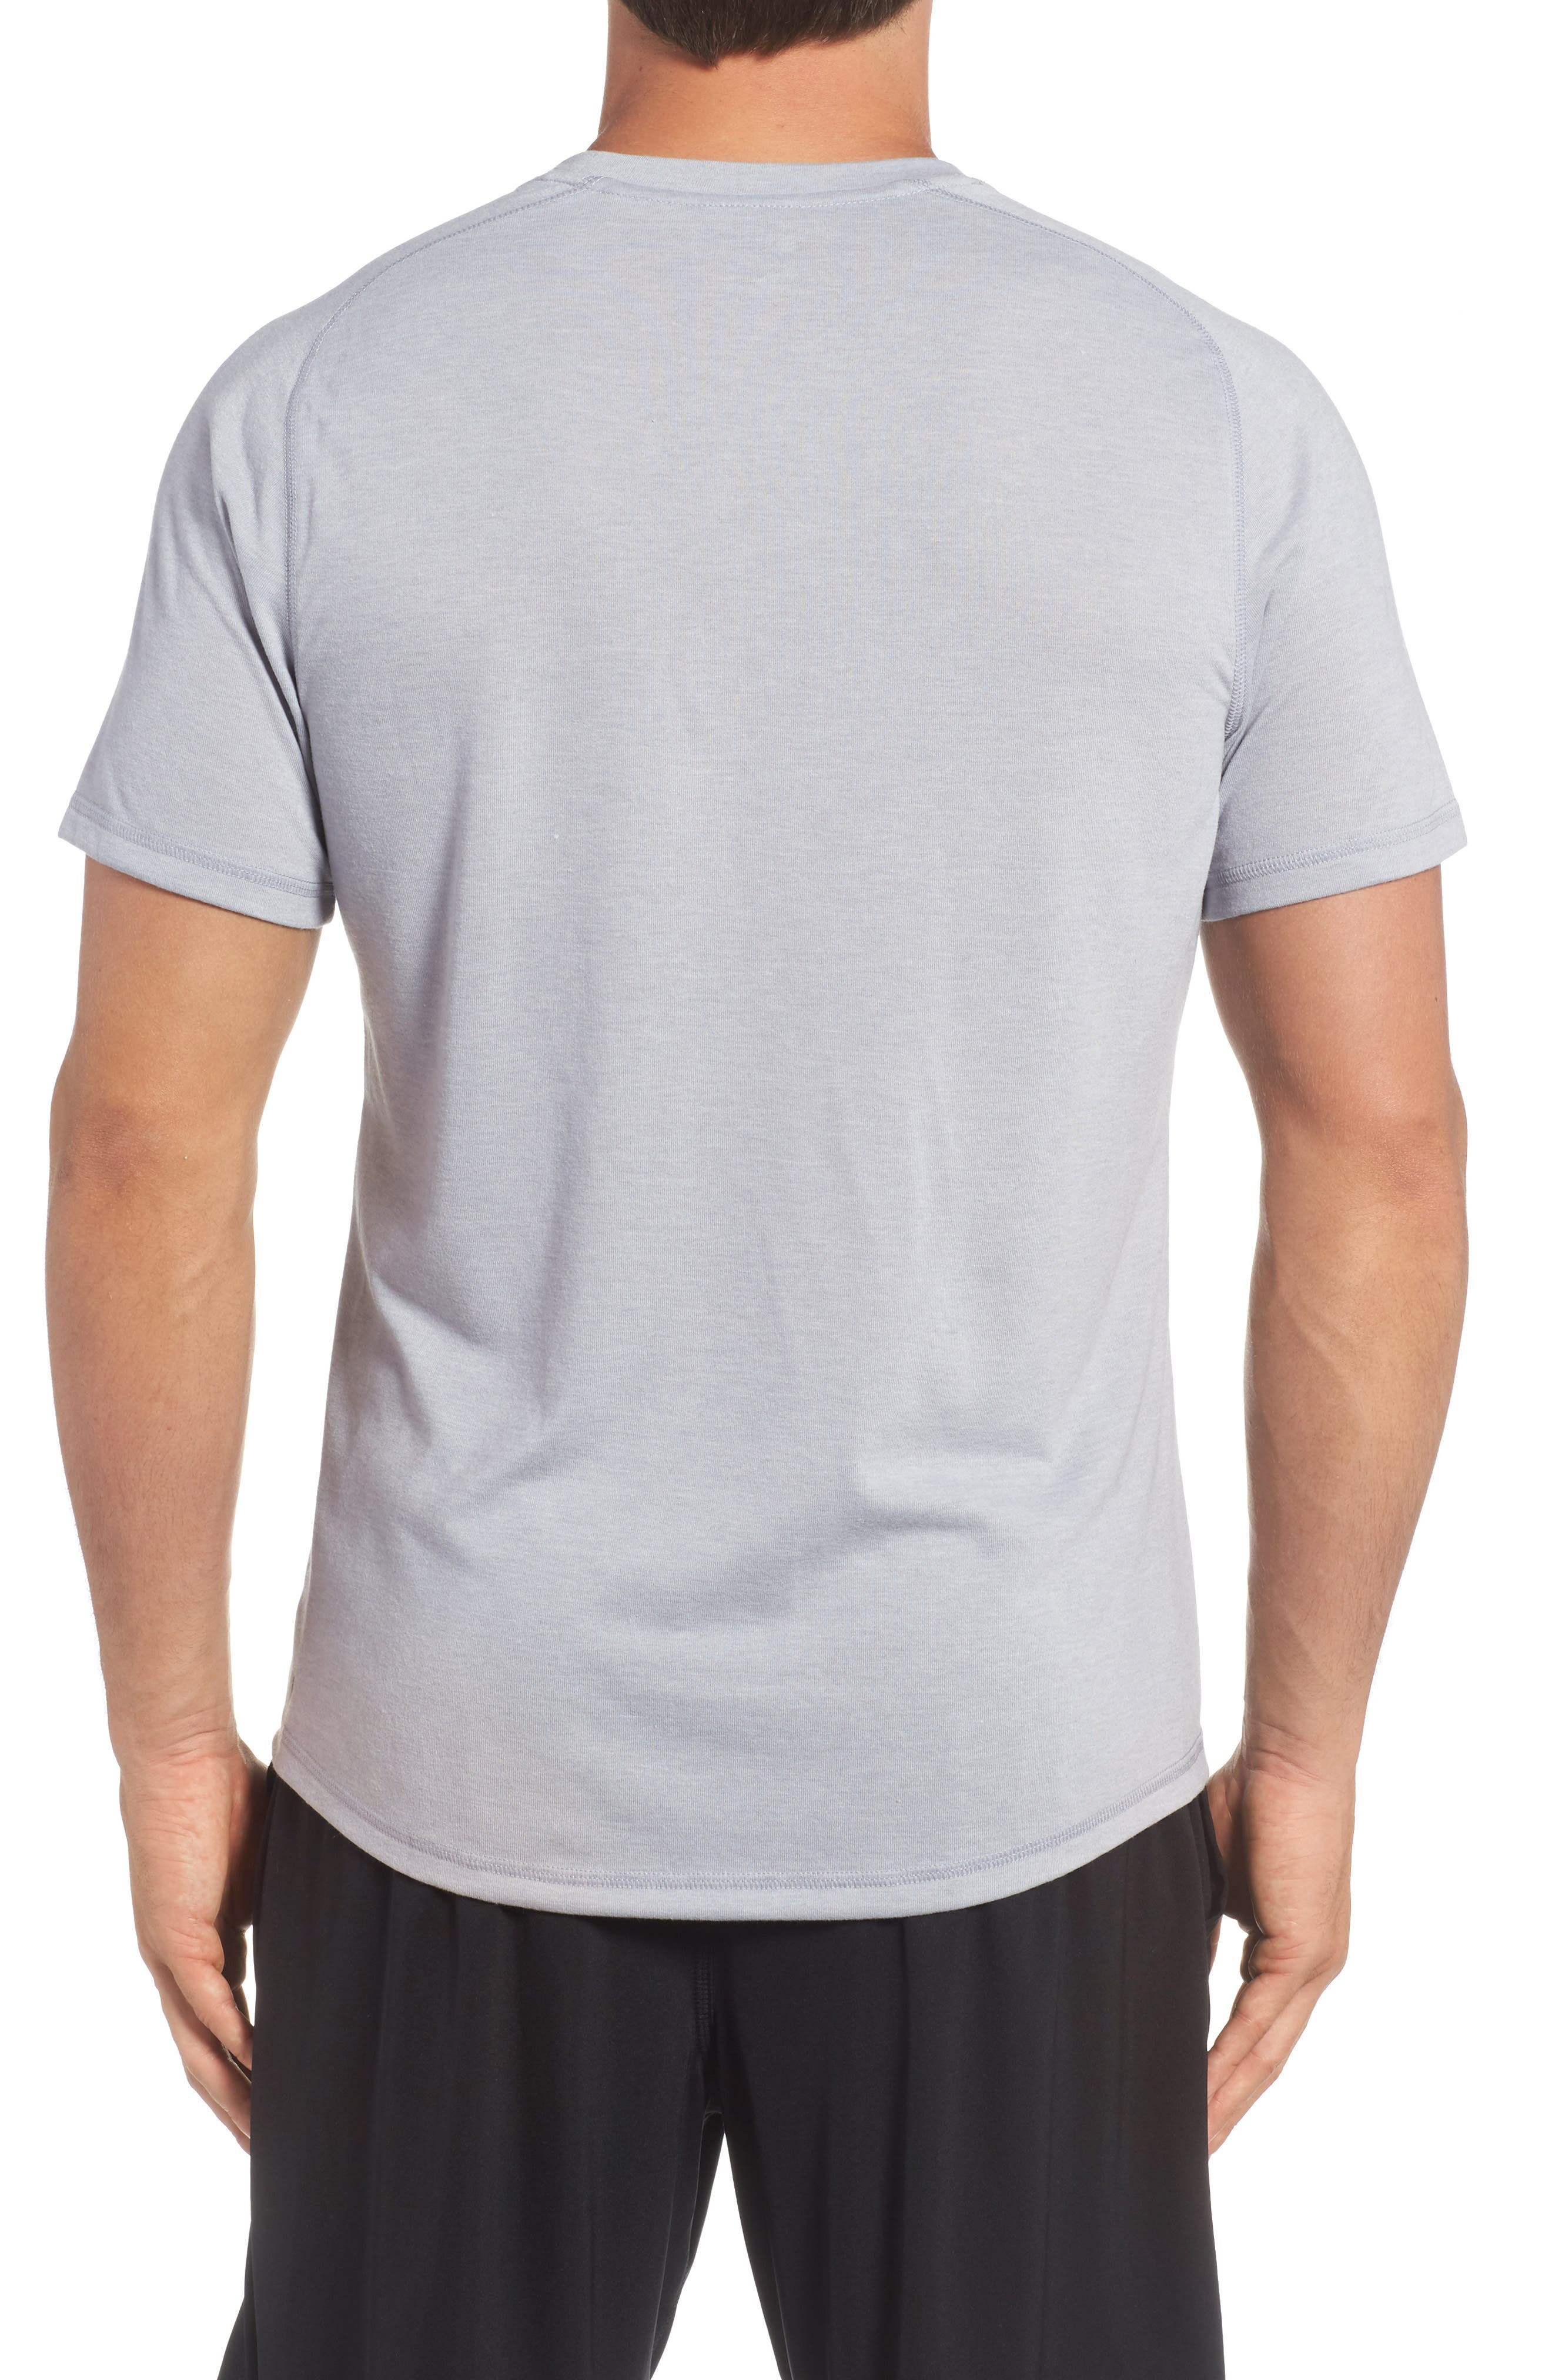 Celsian Training T-Shirt,                             Alternate thumbnail 2, color,                             050